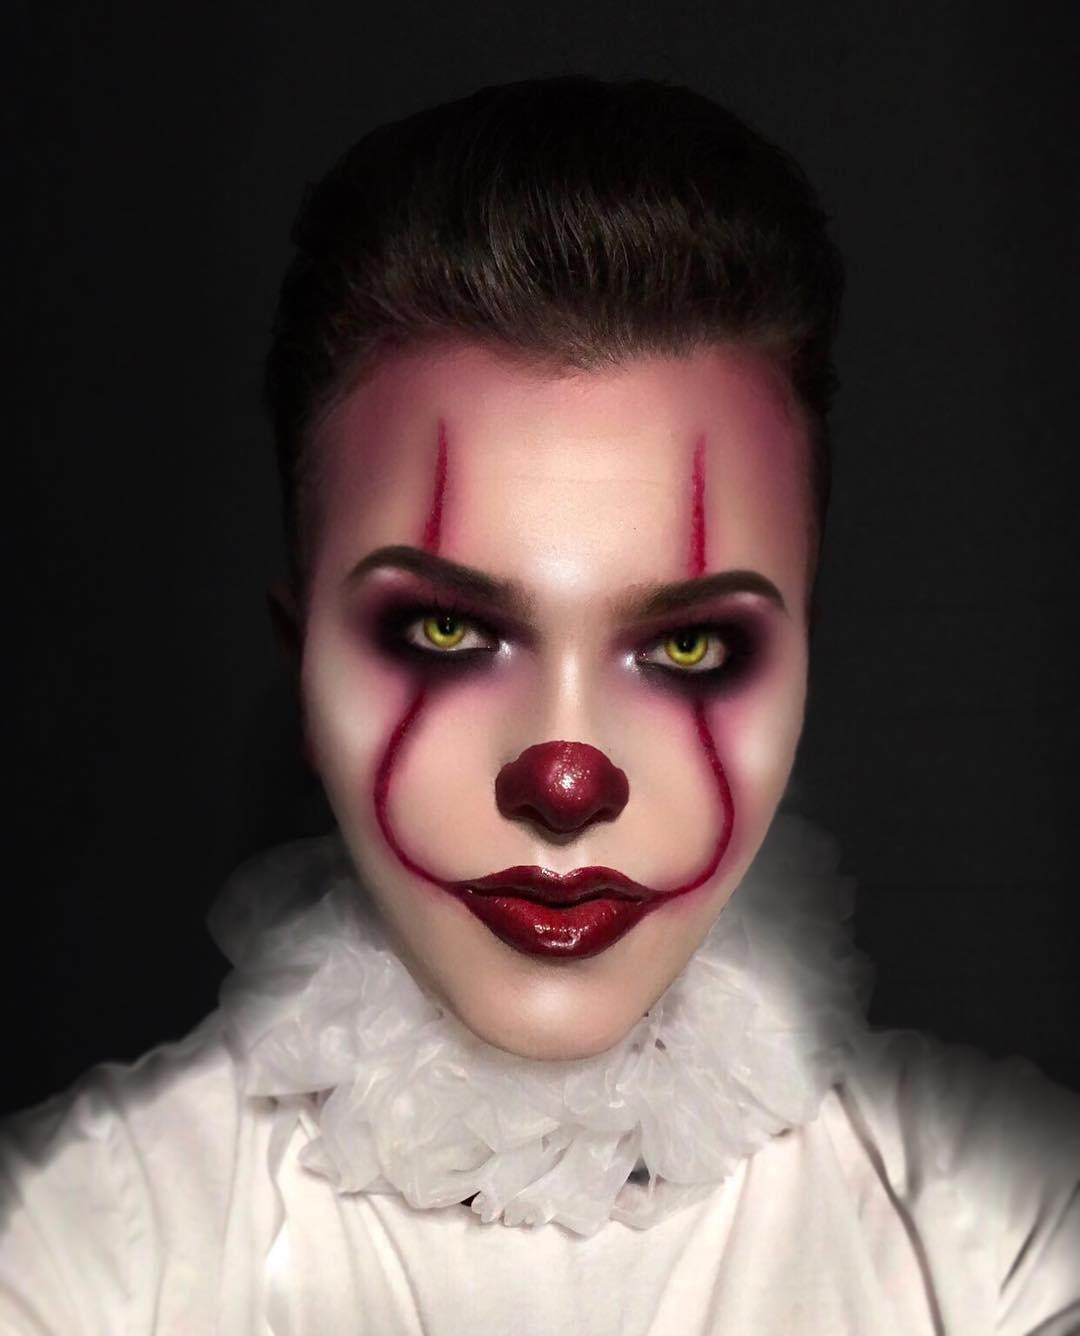 хэллоуин, хэллоуин 2018, хэллоуин фото, хэллоуин макияж рис 6